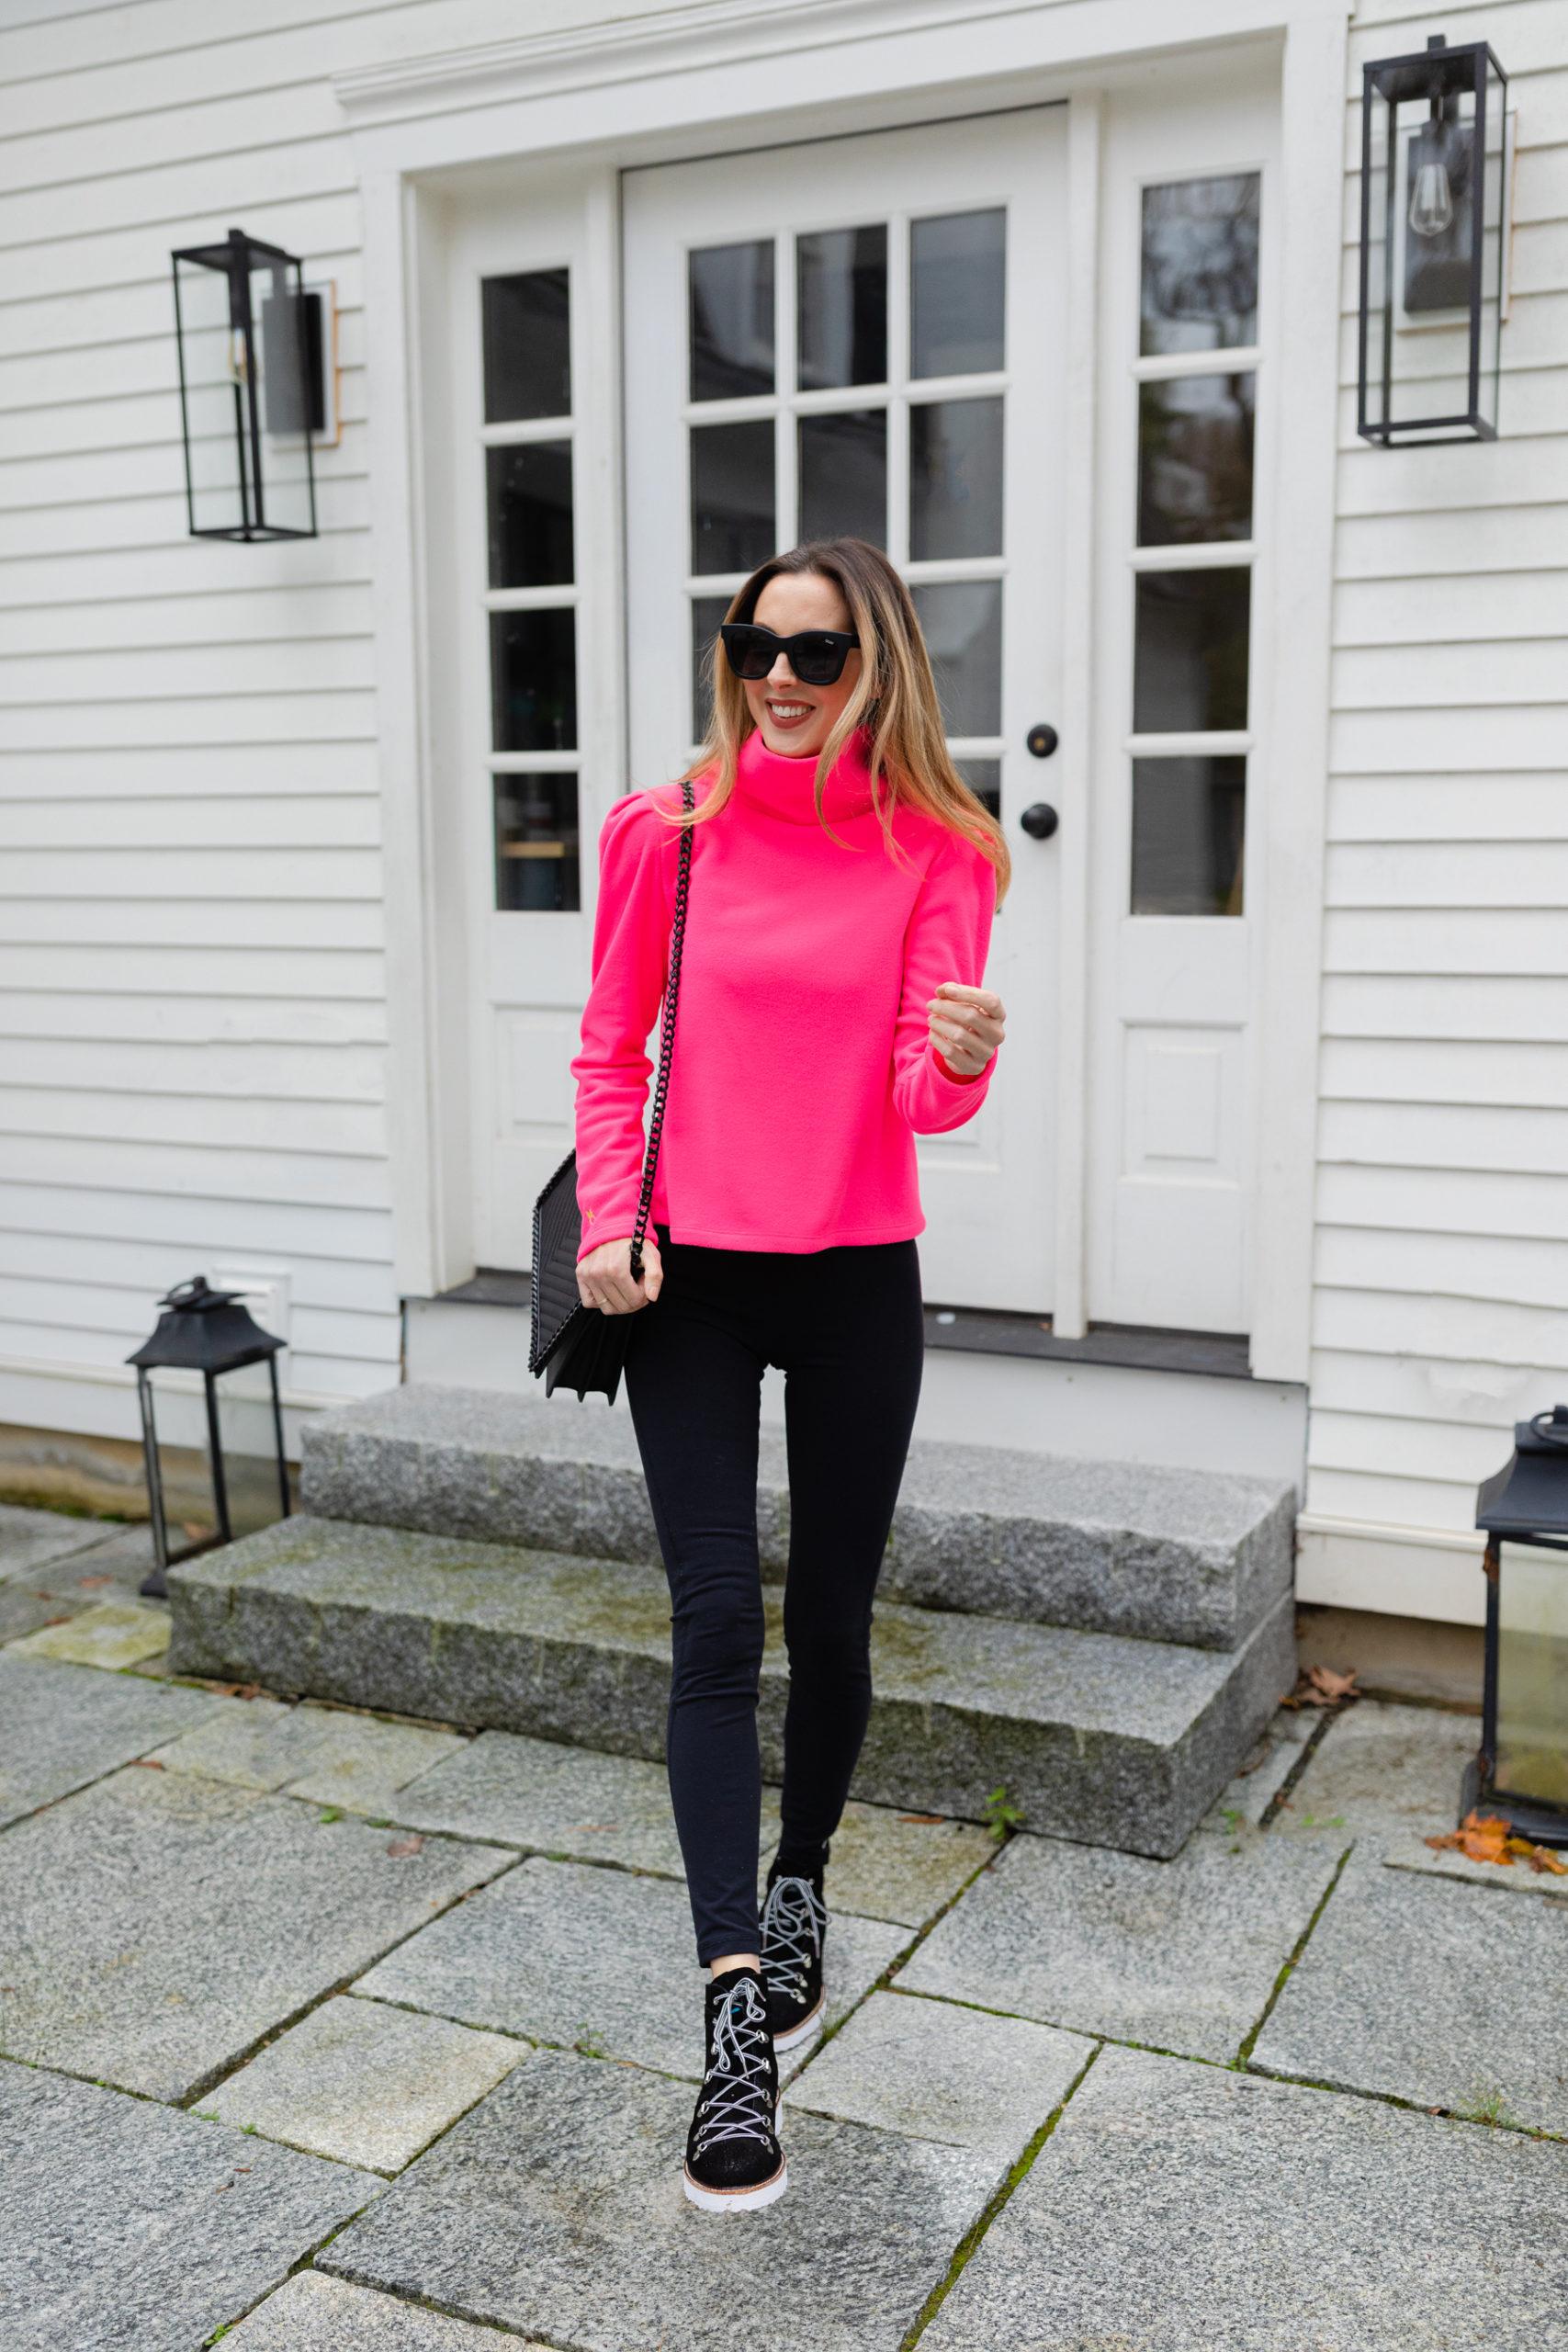 Eva Amurri wears the new Dudley Stephens Palmer Puff Sleeve Fleece in Neon Pink